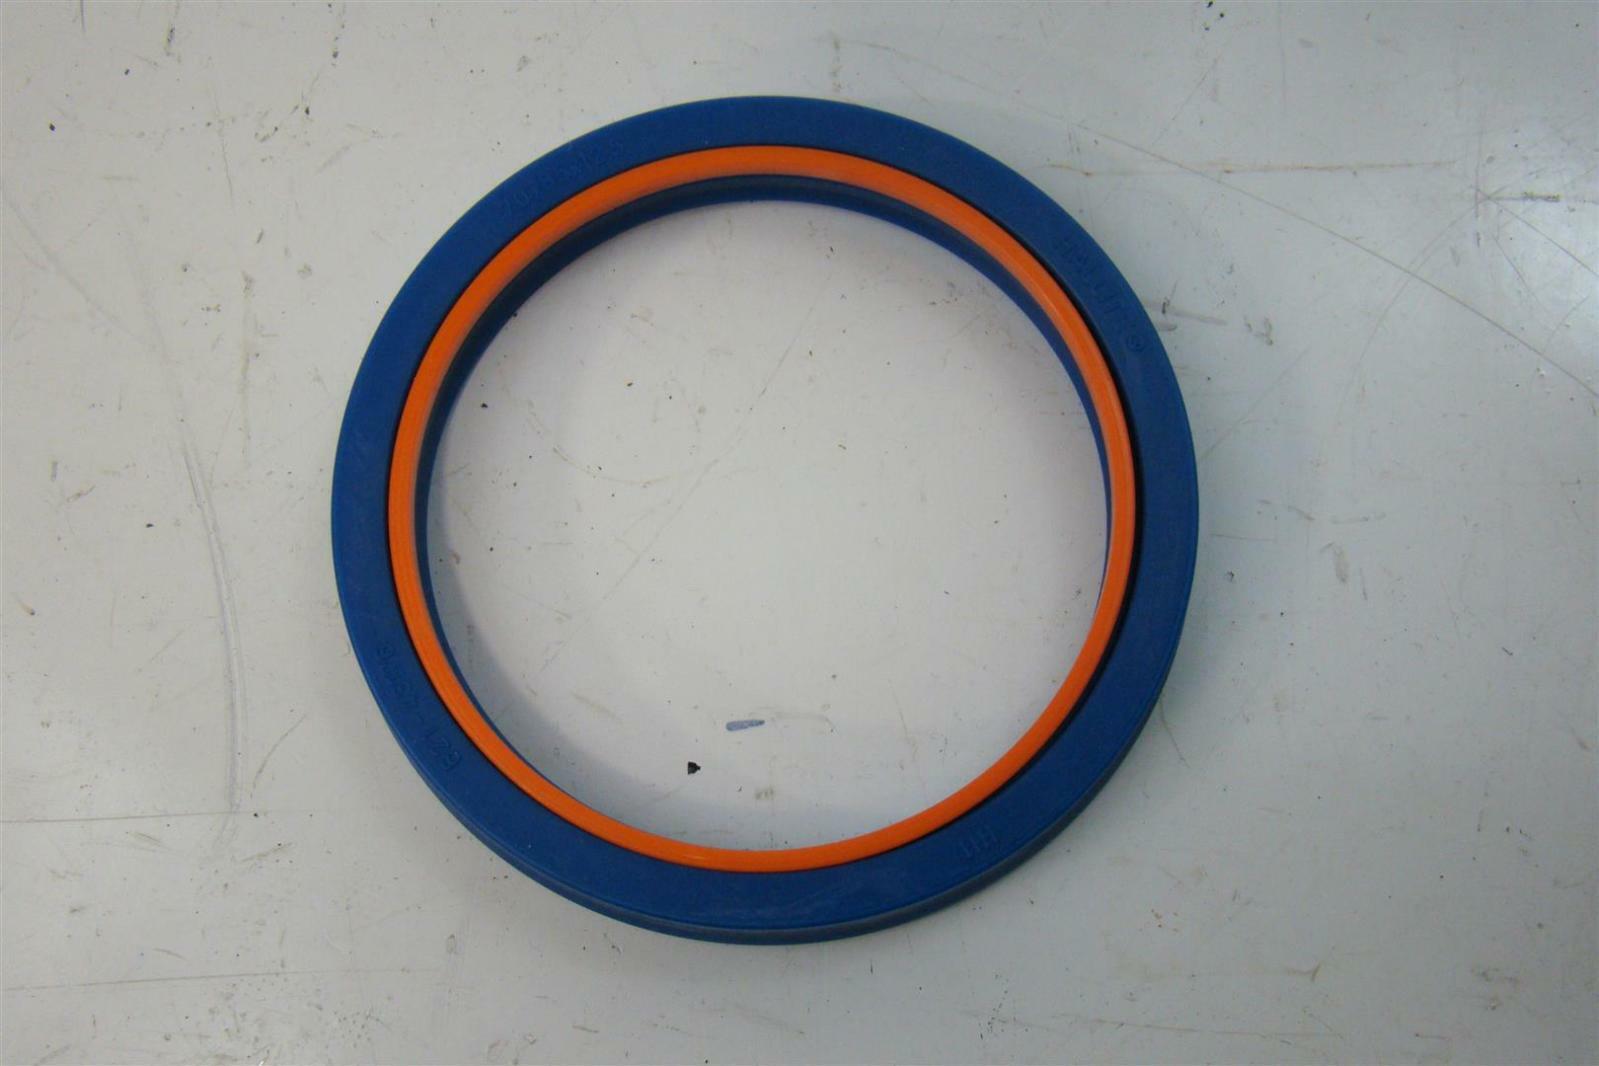 BASL,DASL,TC,WAS, Wellendichtring 1 Stück 20x35x5 AS = Simmerring Oil-Seal